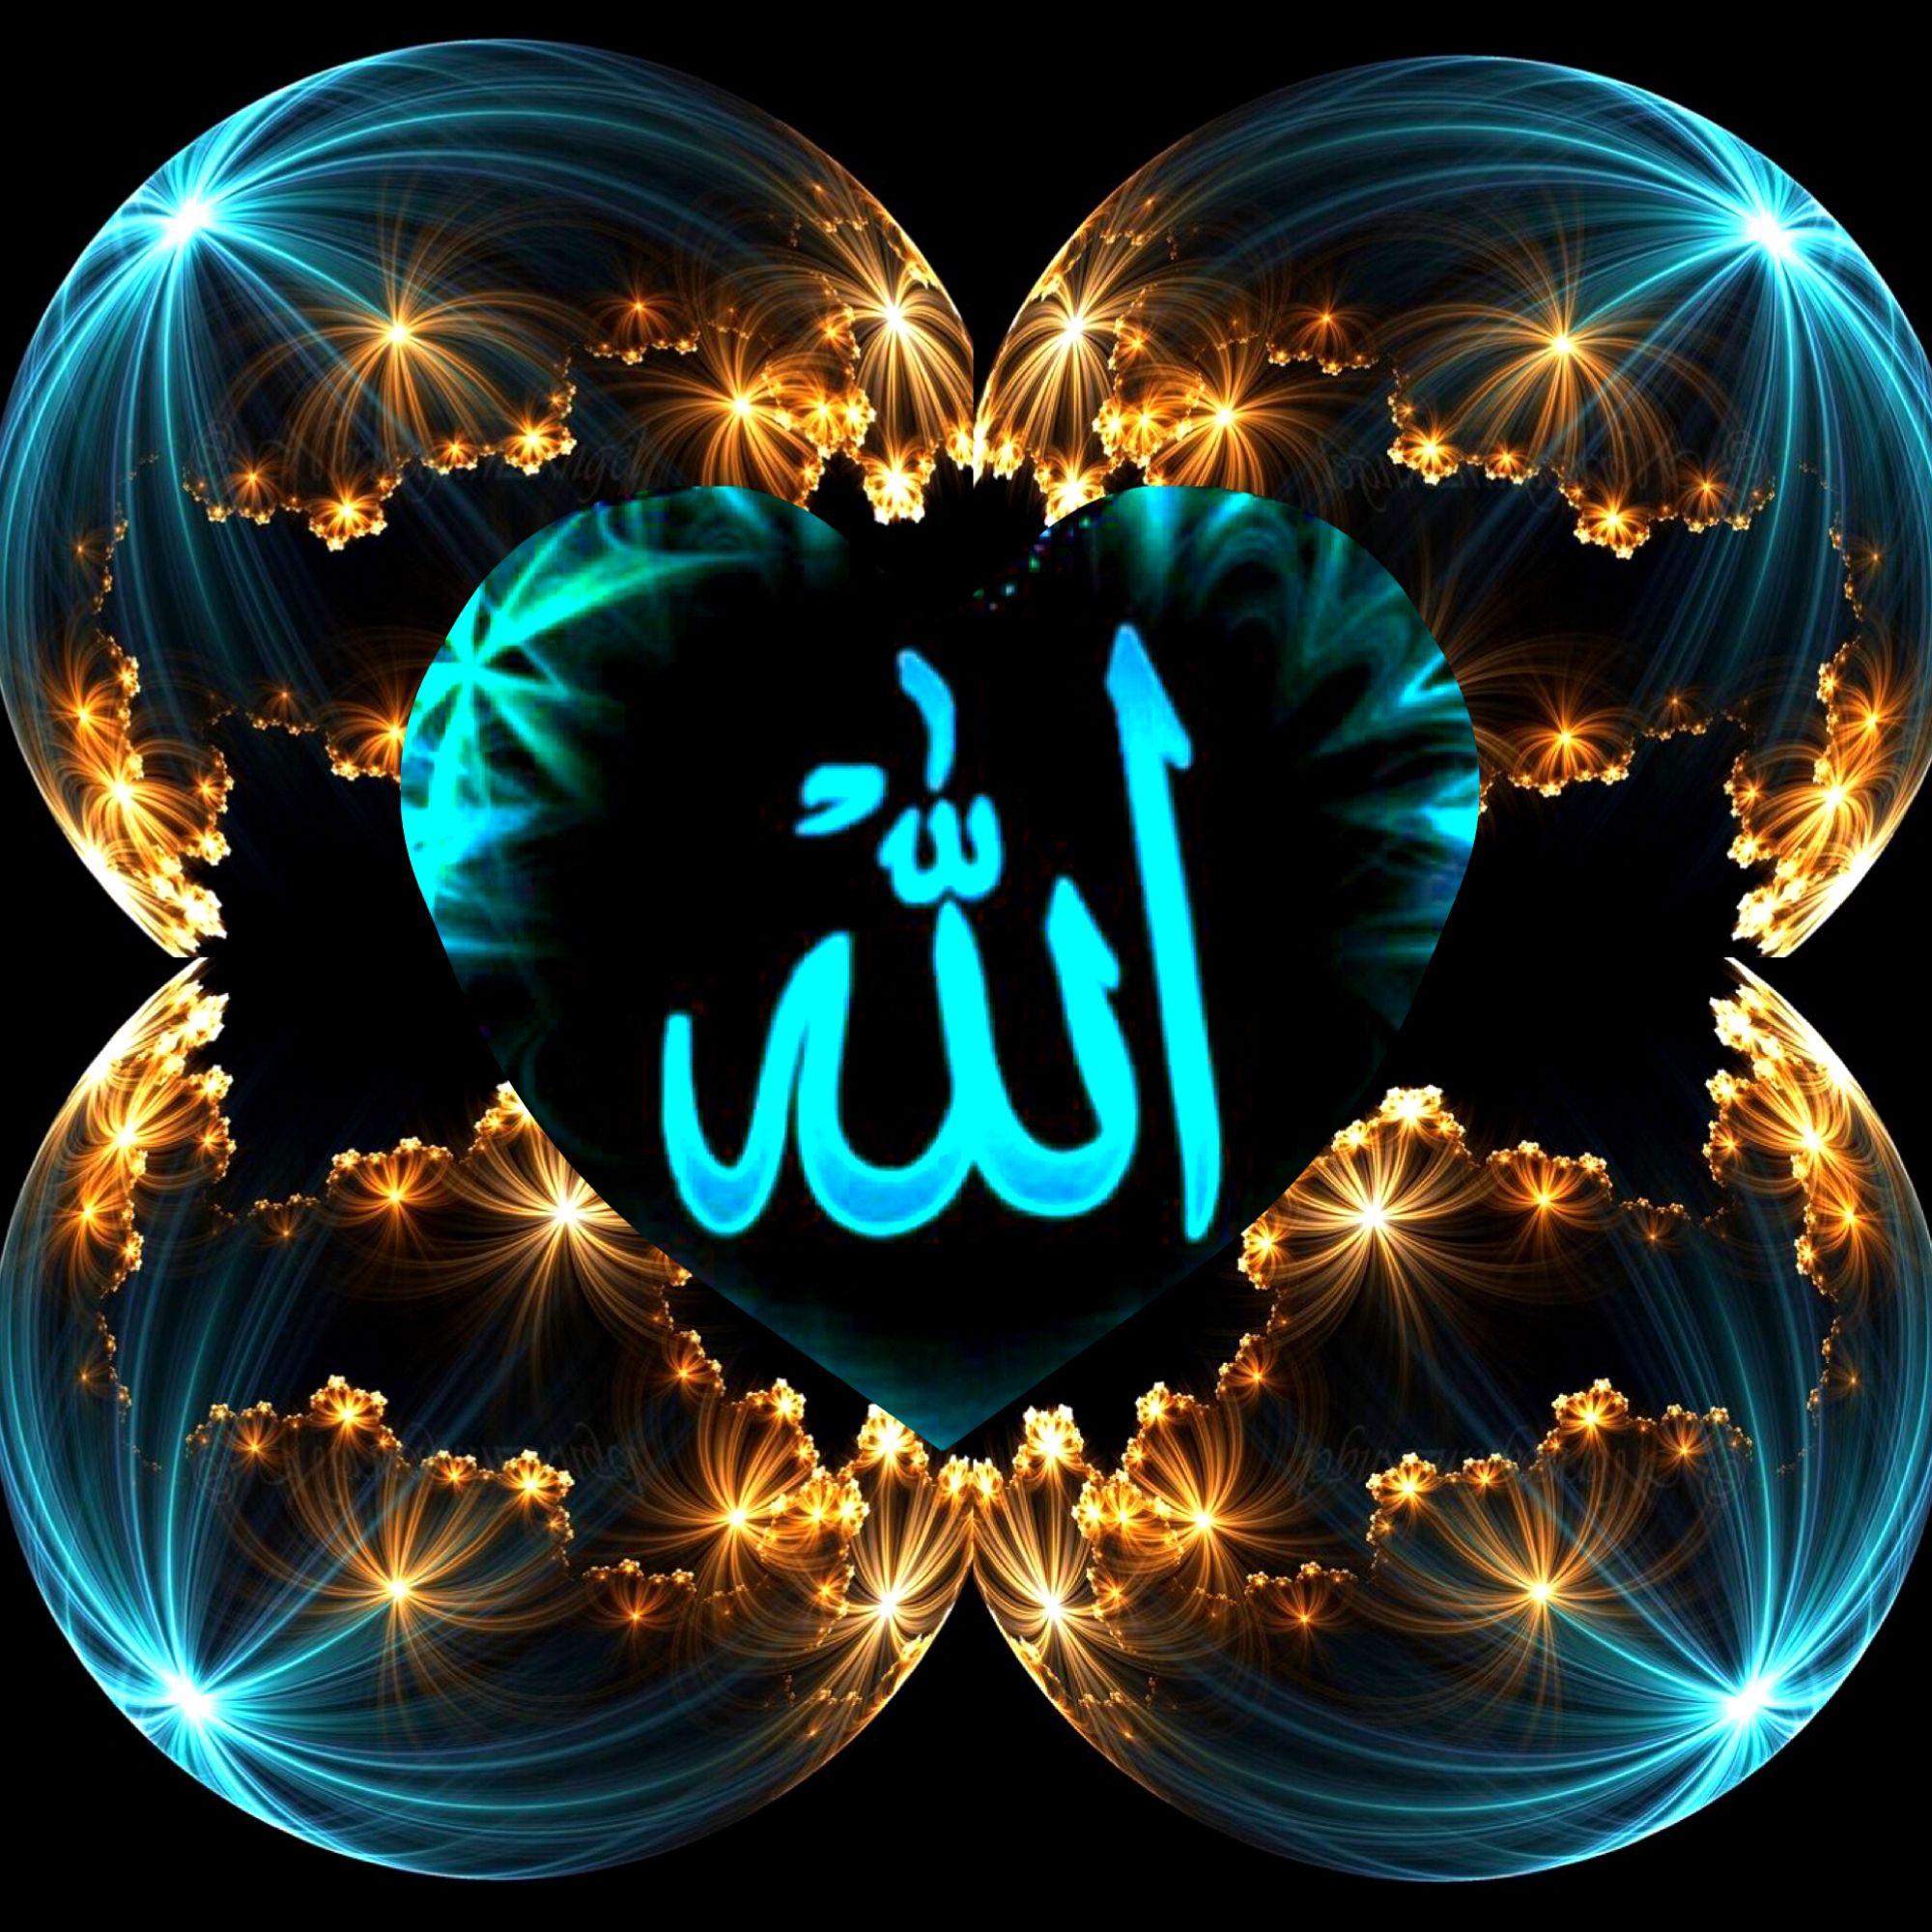 Allah Wallpaper - EnWallpaper